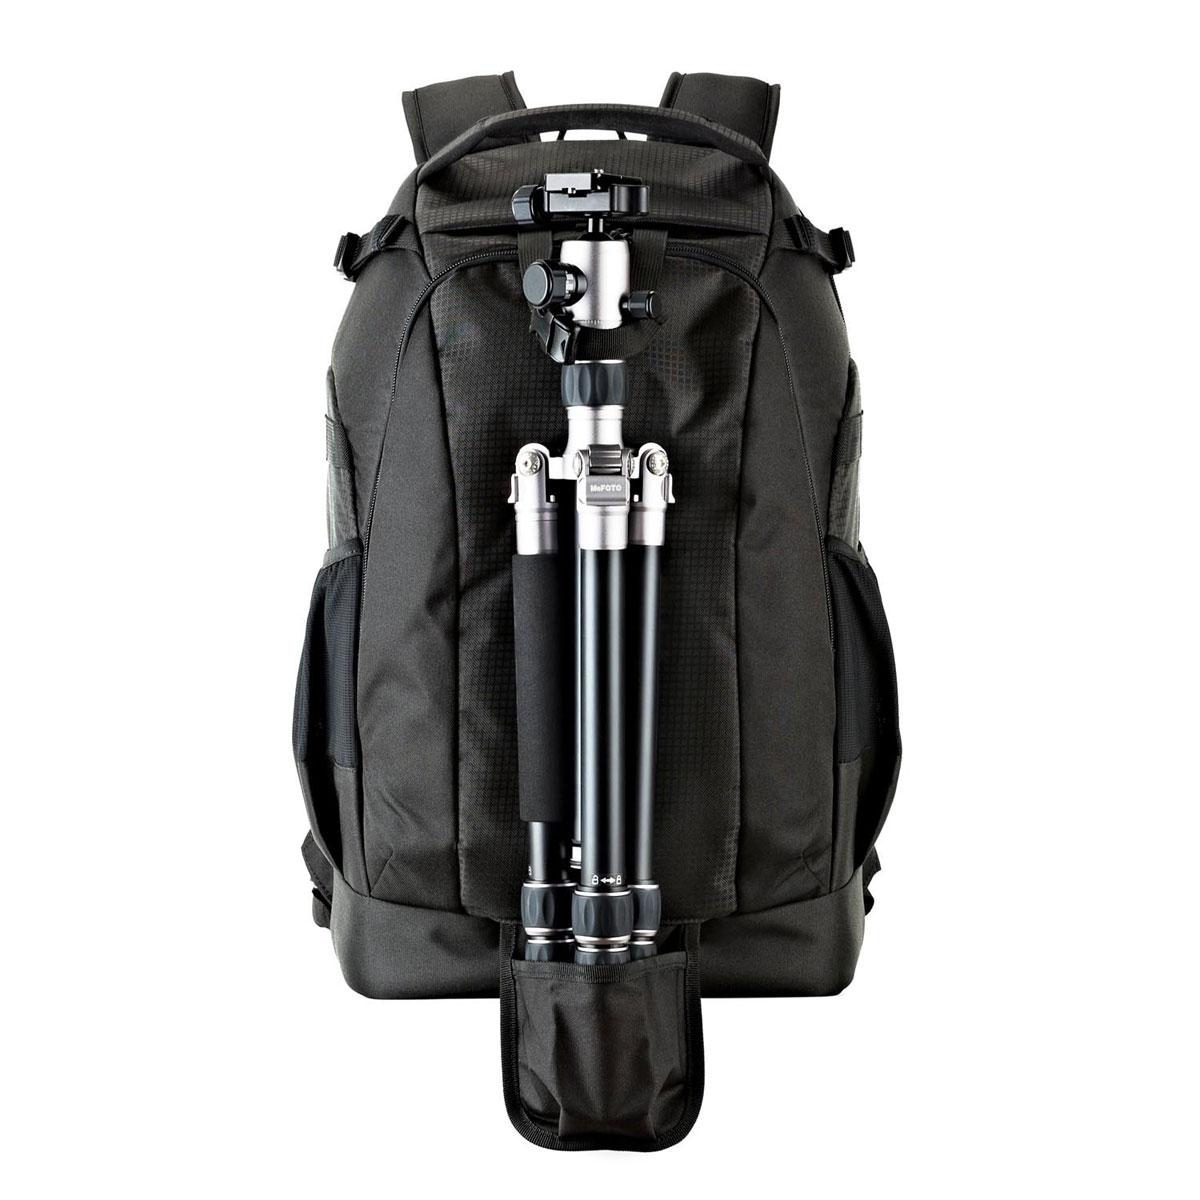 Lowepro Flipside 500 Aw Ii Backpack Black Toploader Zoom 50 Blue Image Of